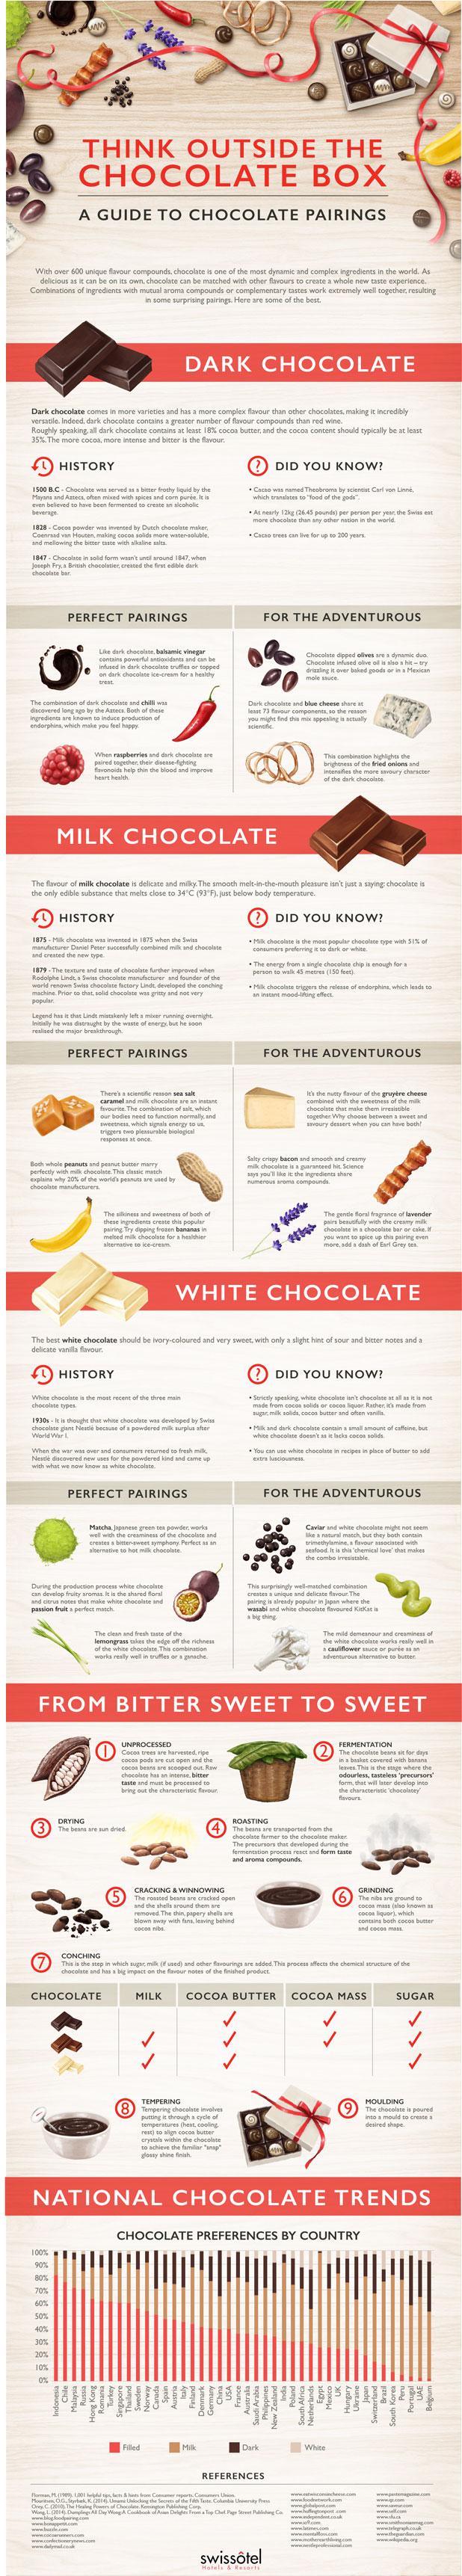 chocolate-pairings